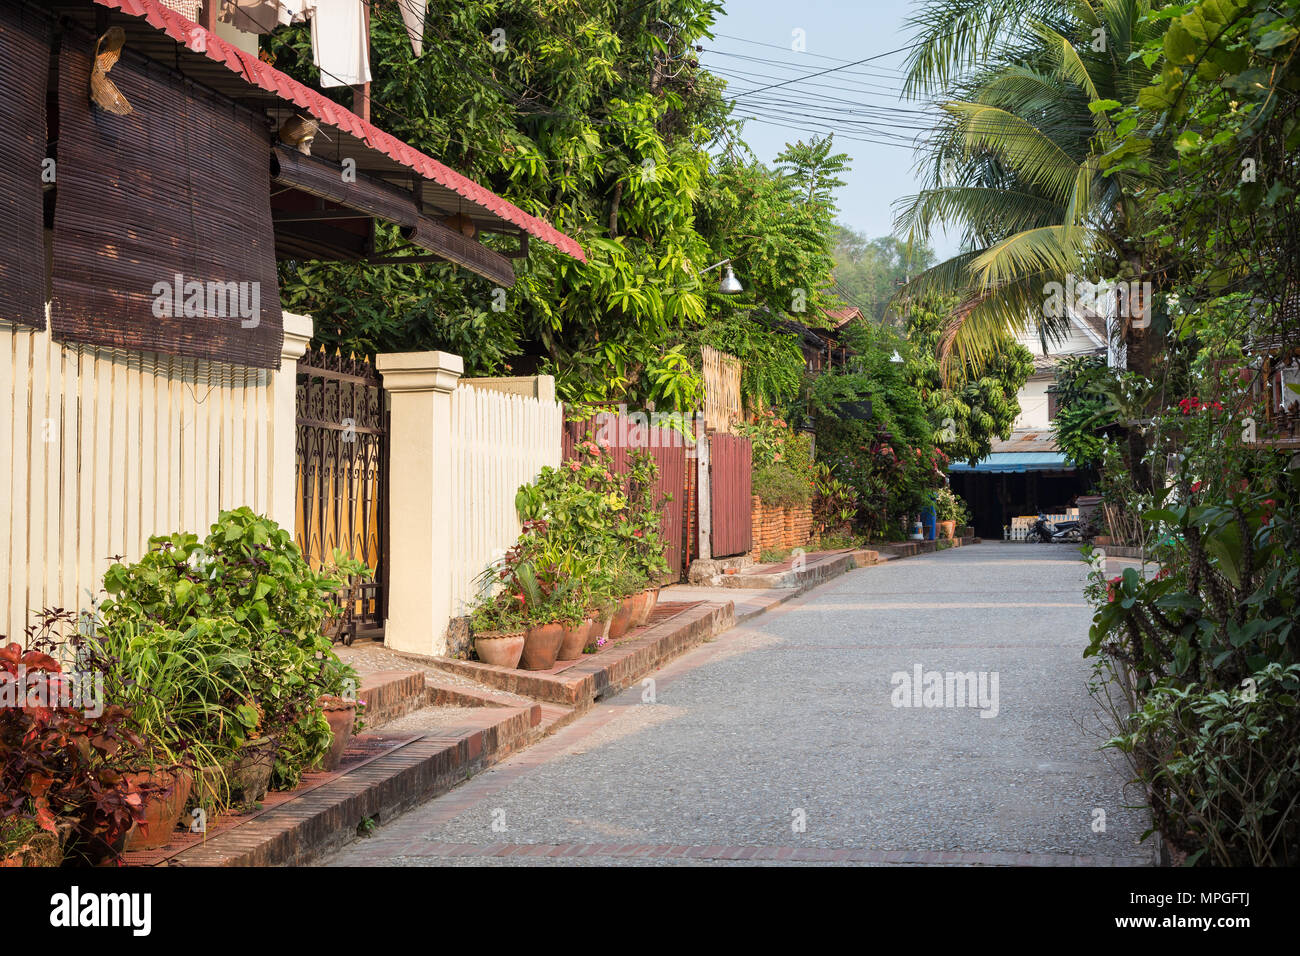 Calle lateral idílico en Luang Prabang, Laos, en un día soleado. Imagen De Stock